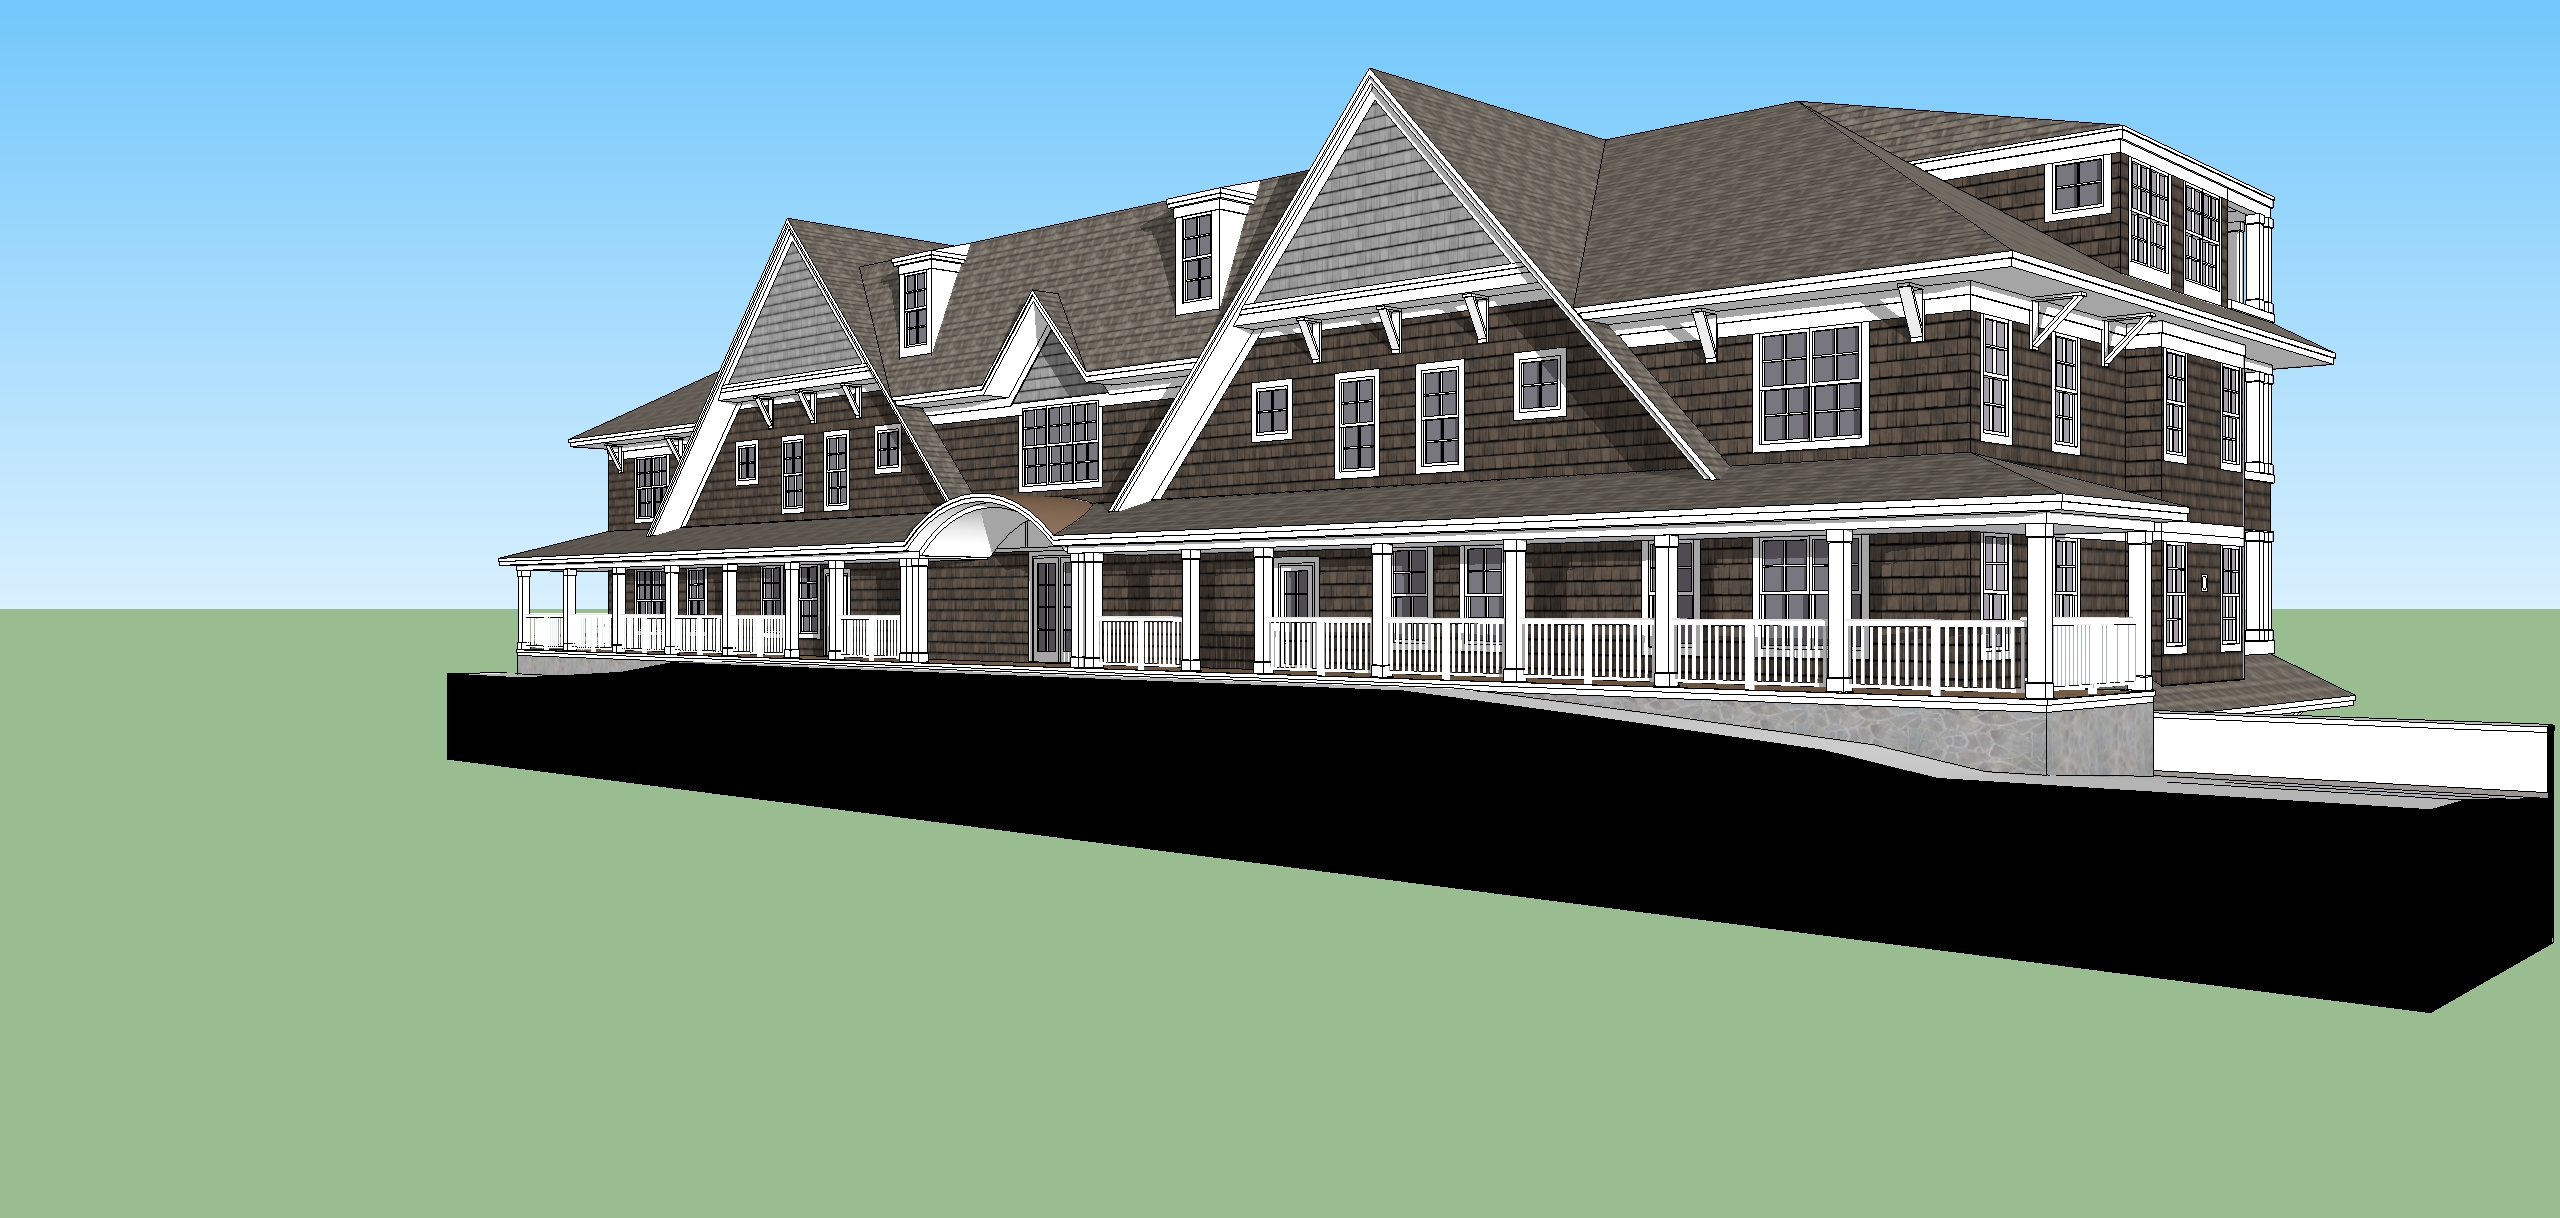 Bath Maine RiverWalk Condos Real Estate for Sale